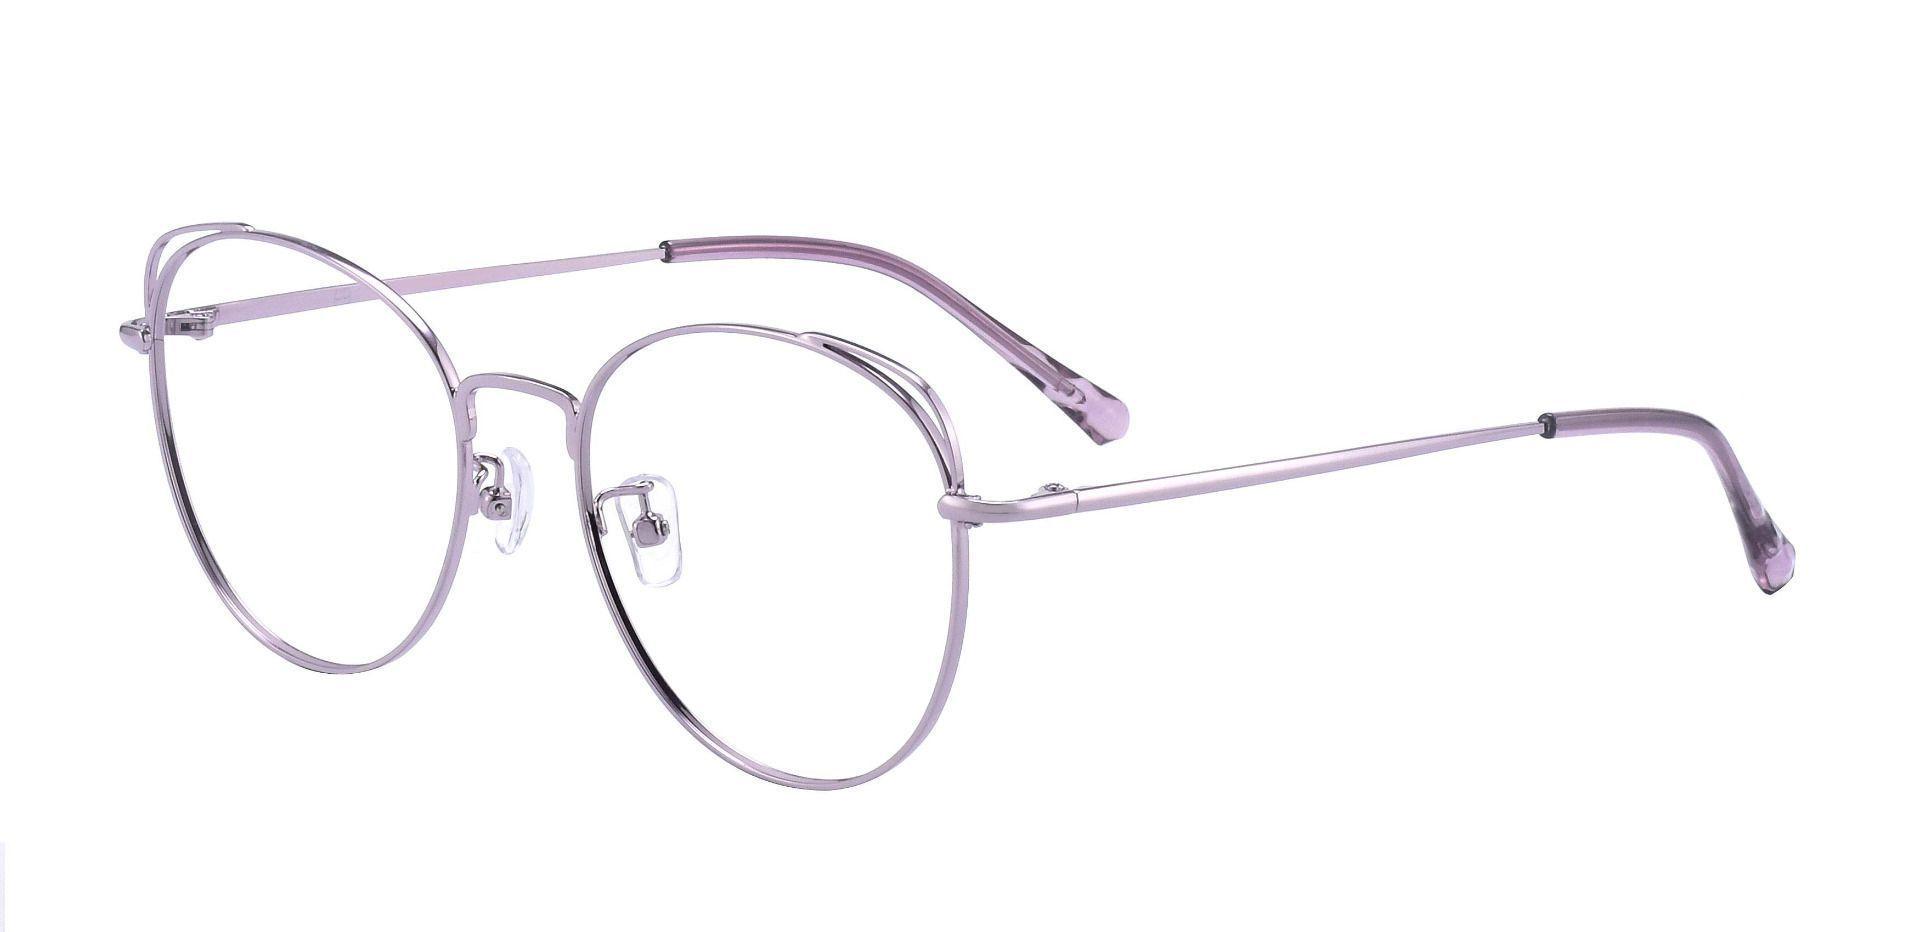 Ellie Oval Prescription Glasses - Lavender